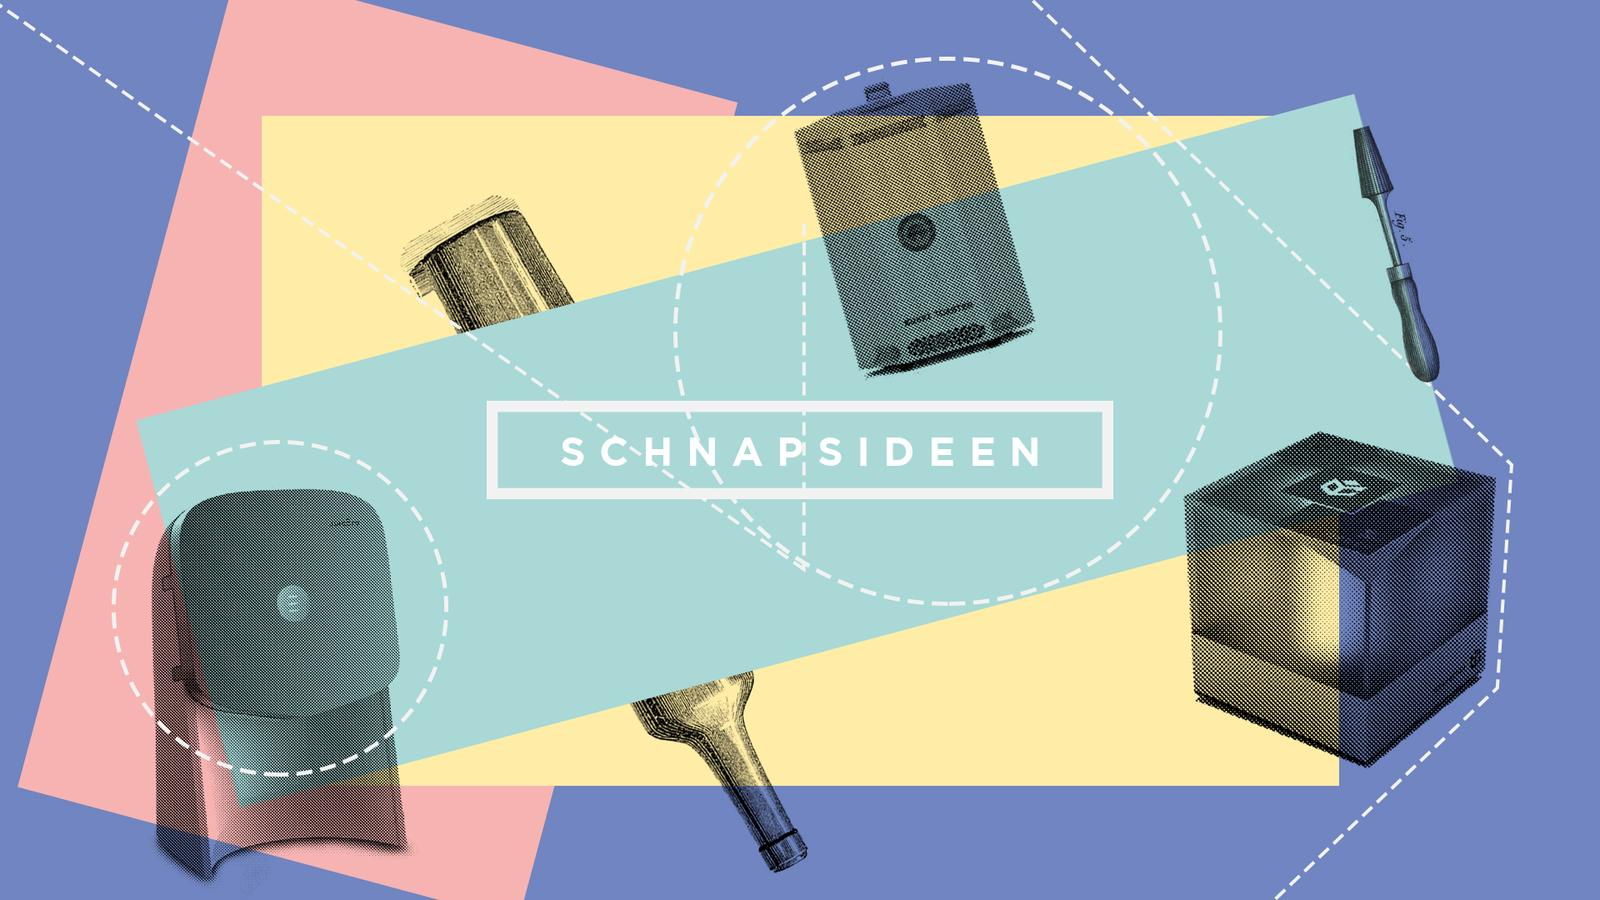 Schnapsidee 3 Start